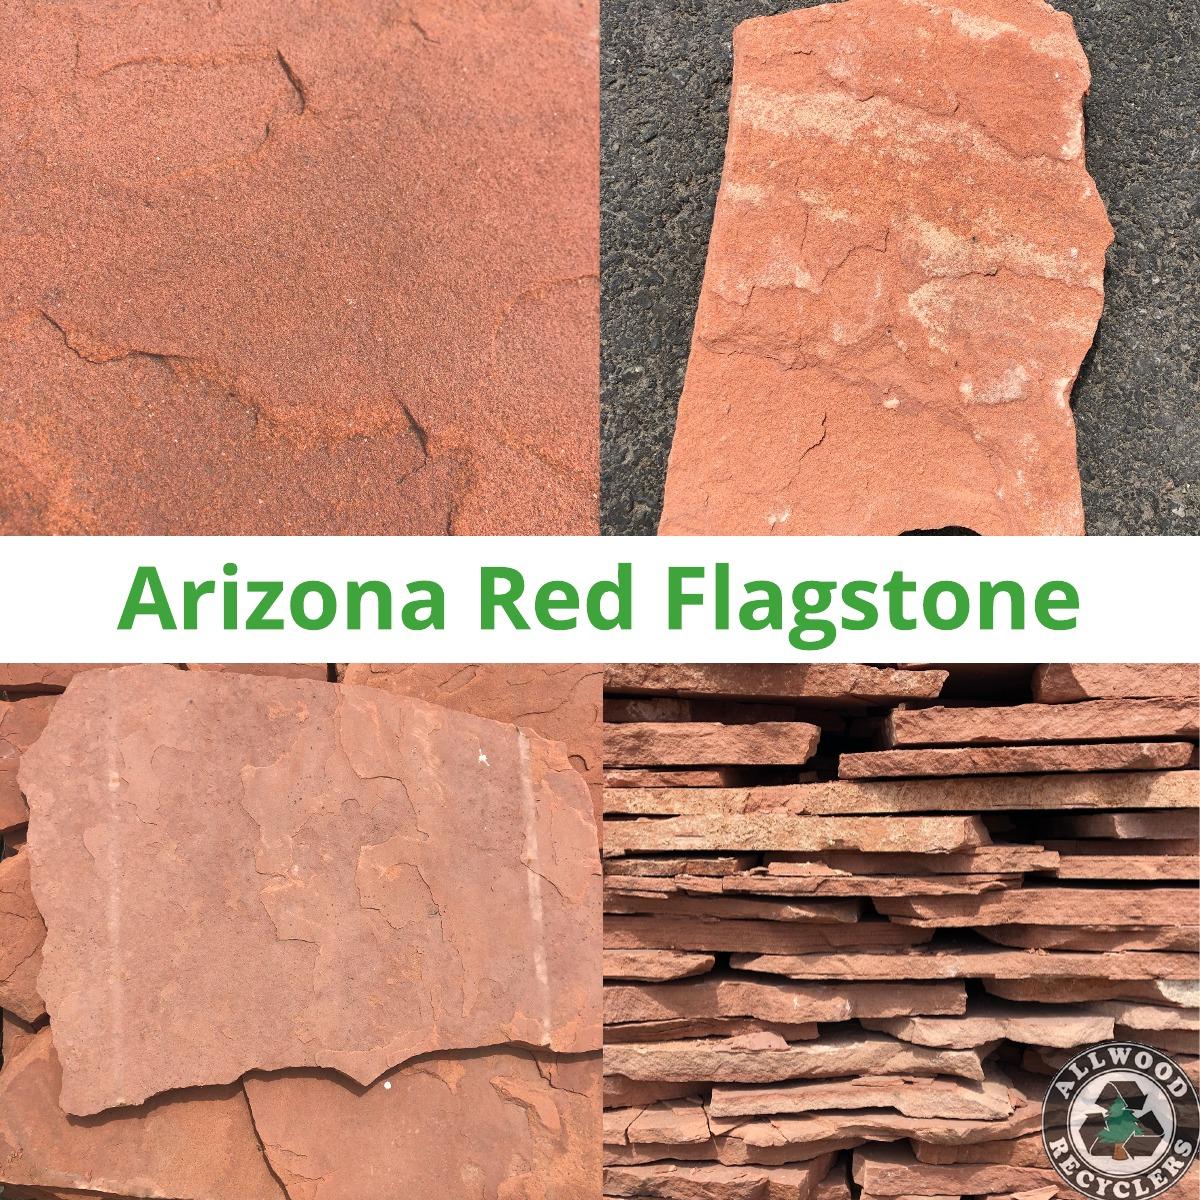 Arizona Red Flagstone